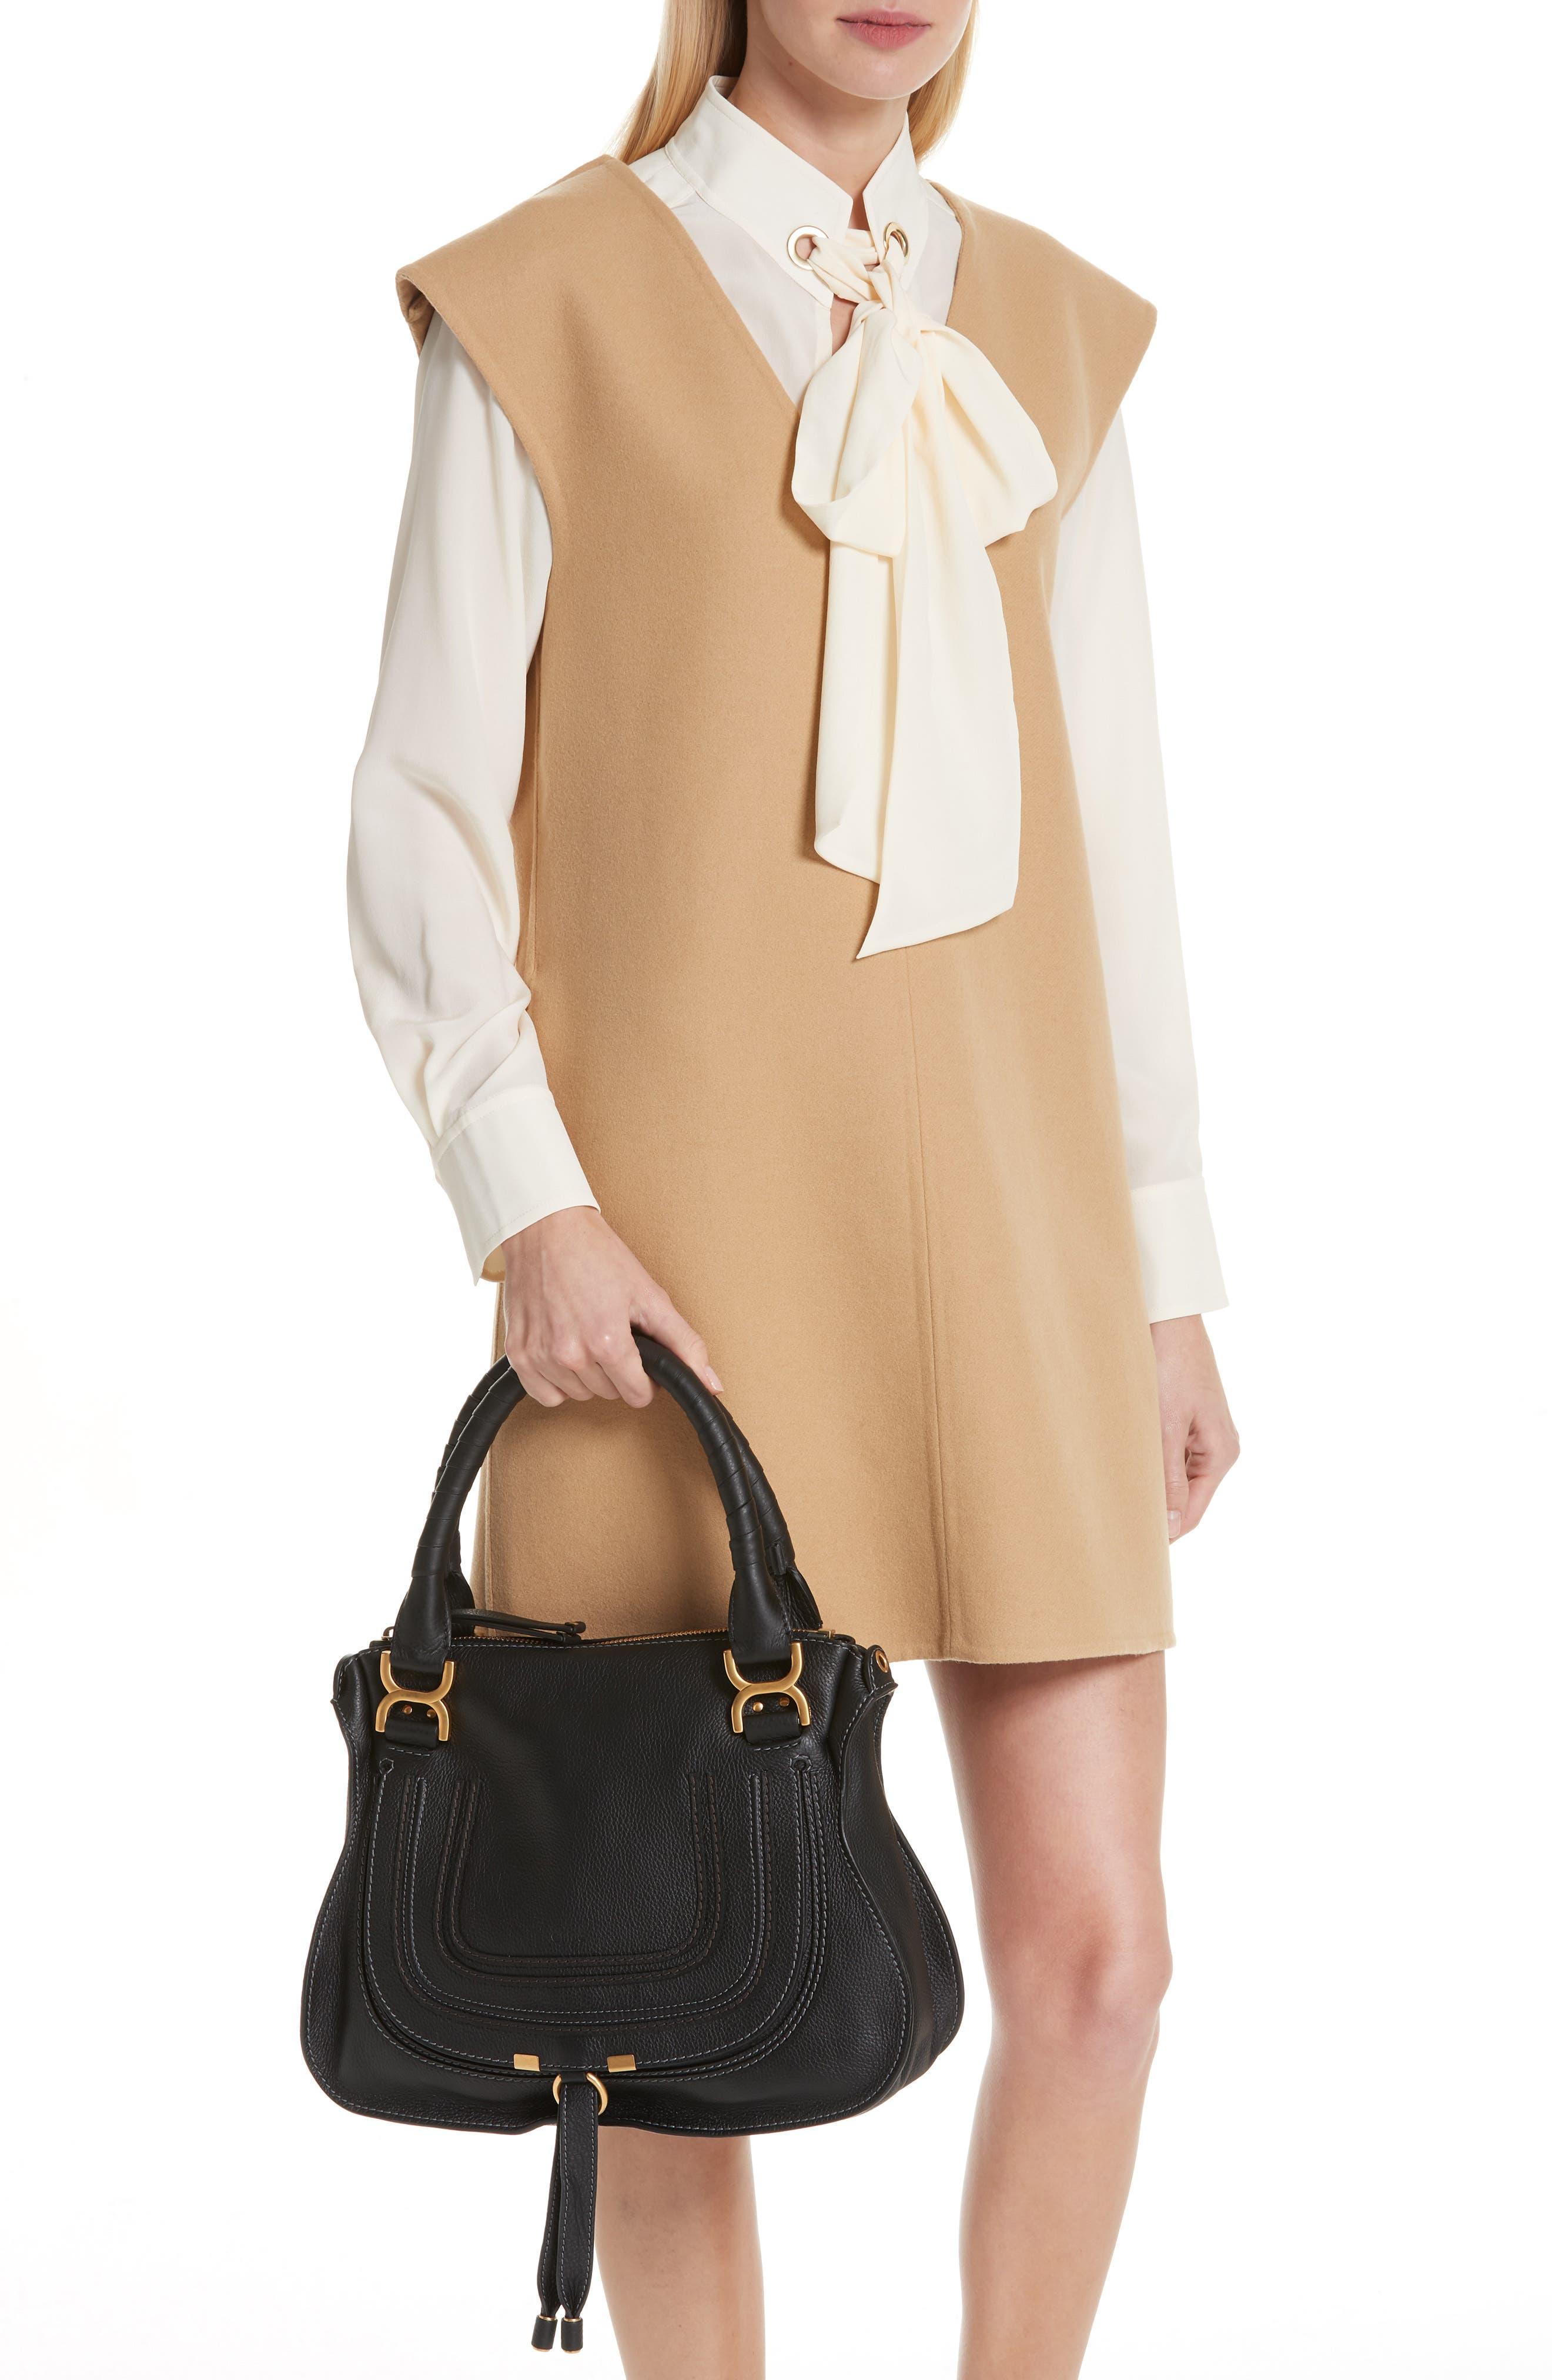 CHLOÉ, 'Medium Marcie' Leather Satchel, Alternate thumbnail 3, color, BLACK GOLD HRDWRE